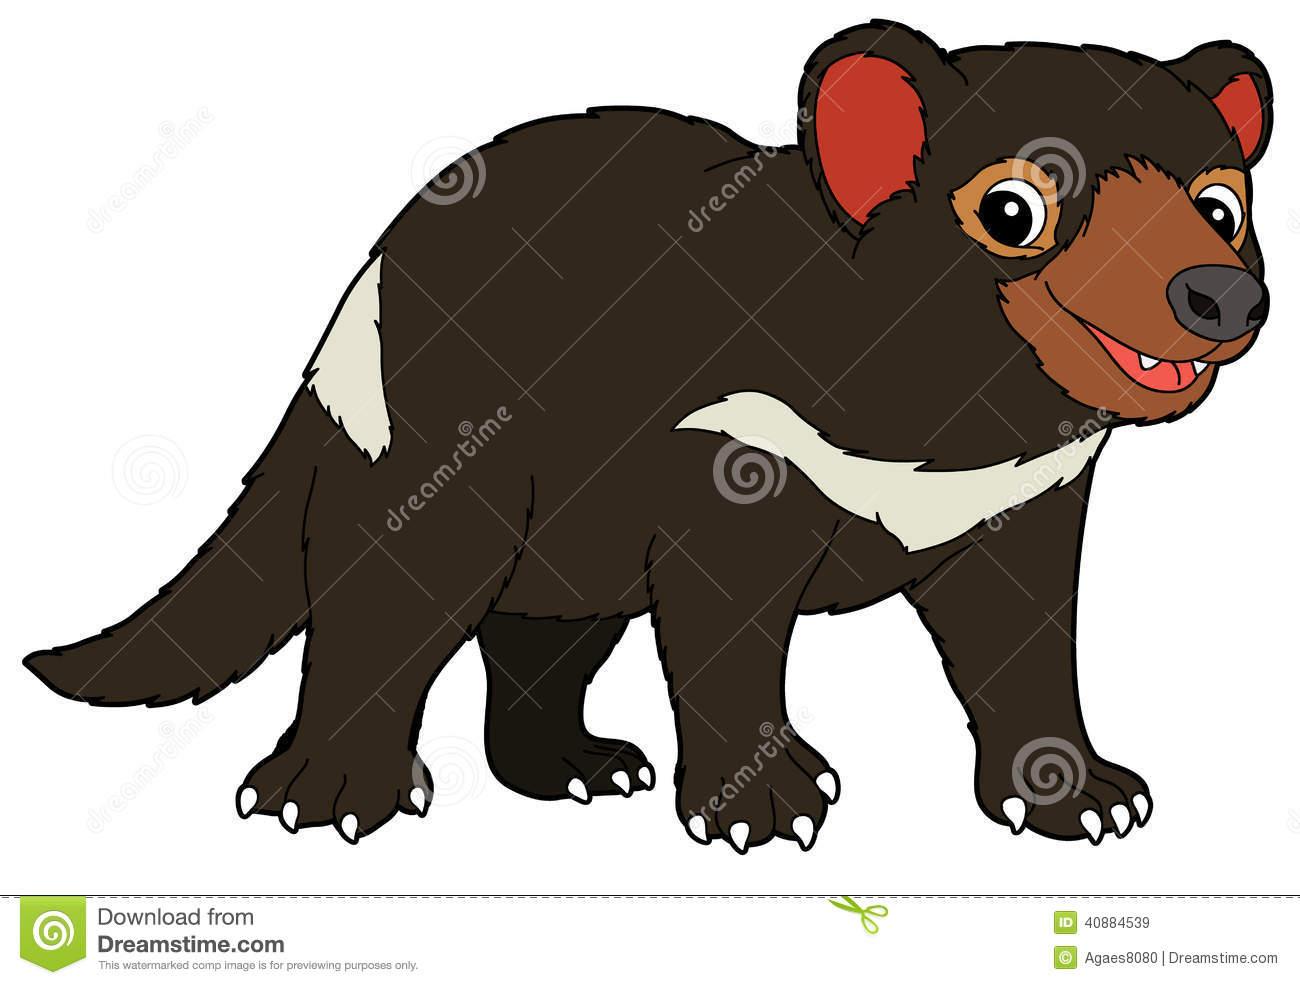 Cartoon Animal - Tasmanian .-Cartoon animal - tasmanian .-0